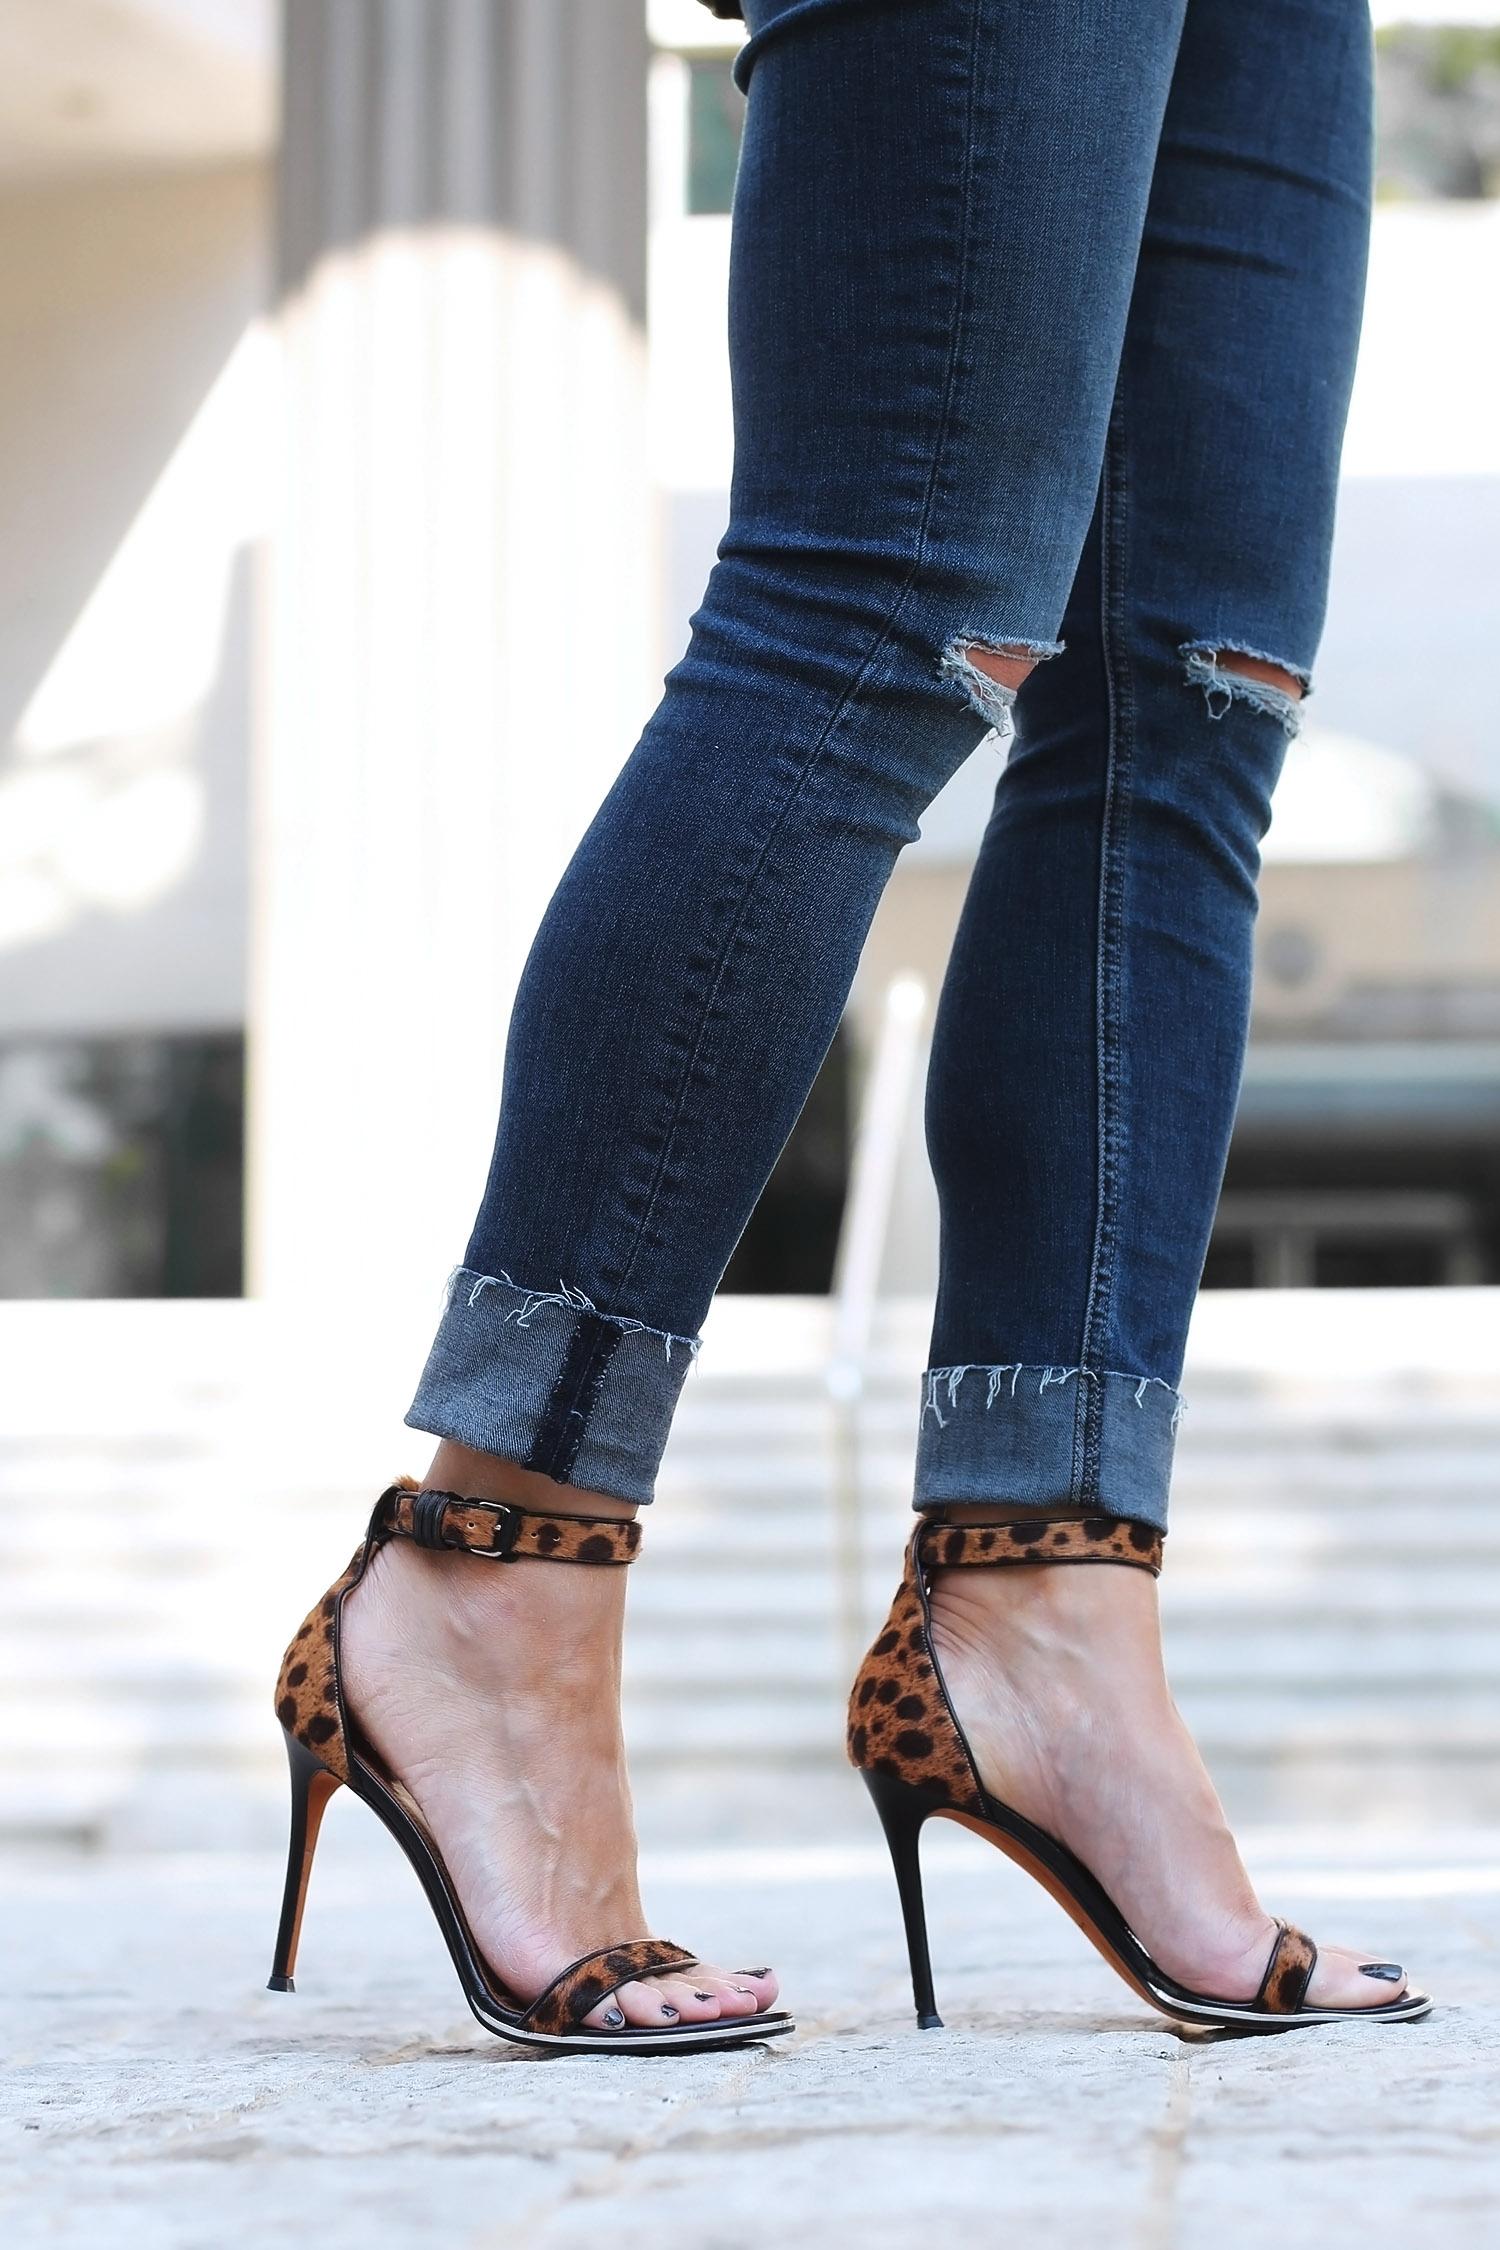 Givenchy Nadia Sandals, Leopard Print Sandals